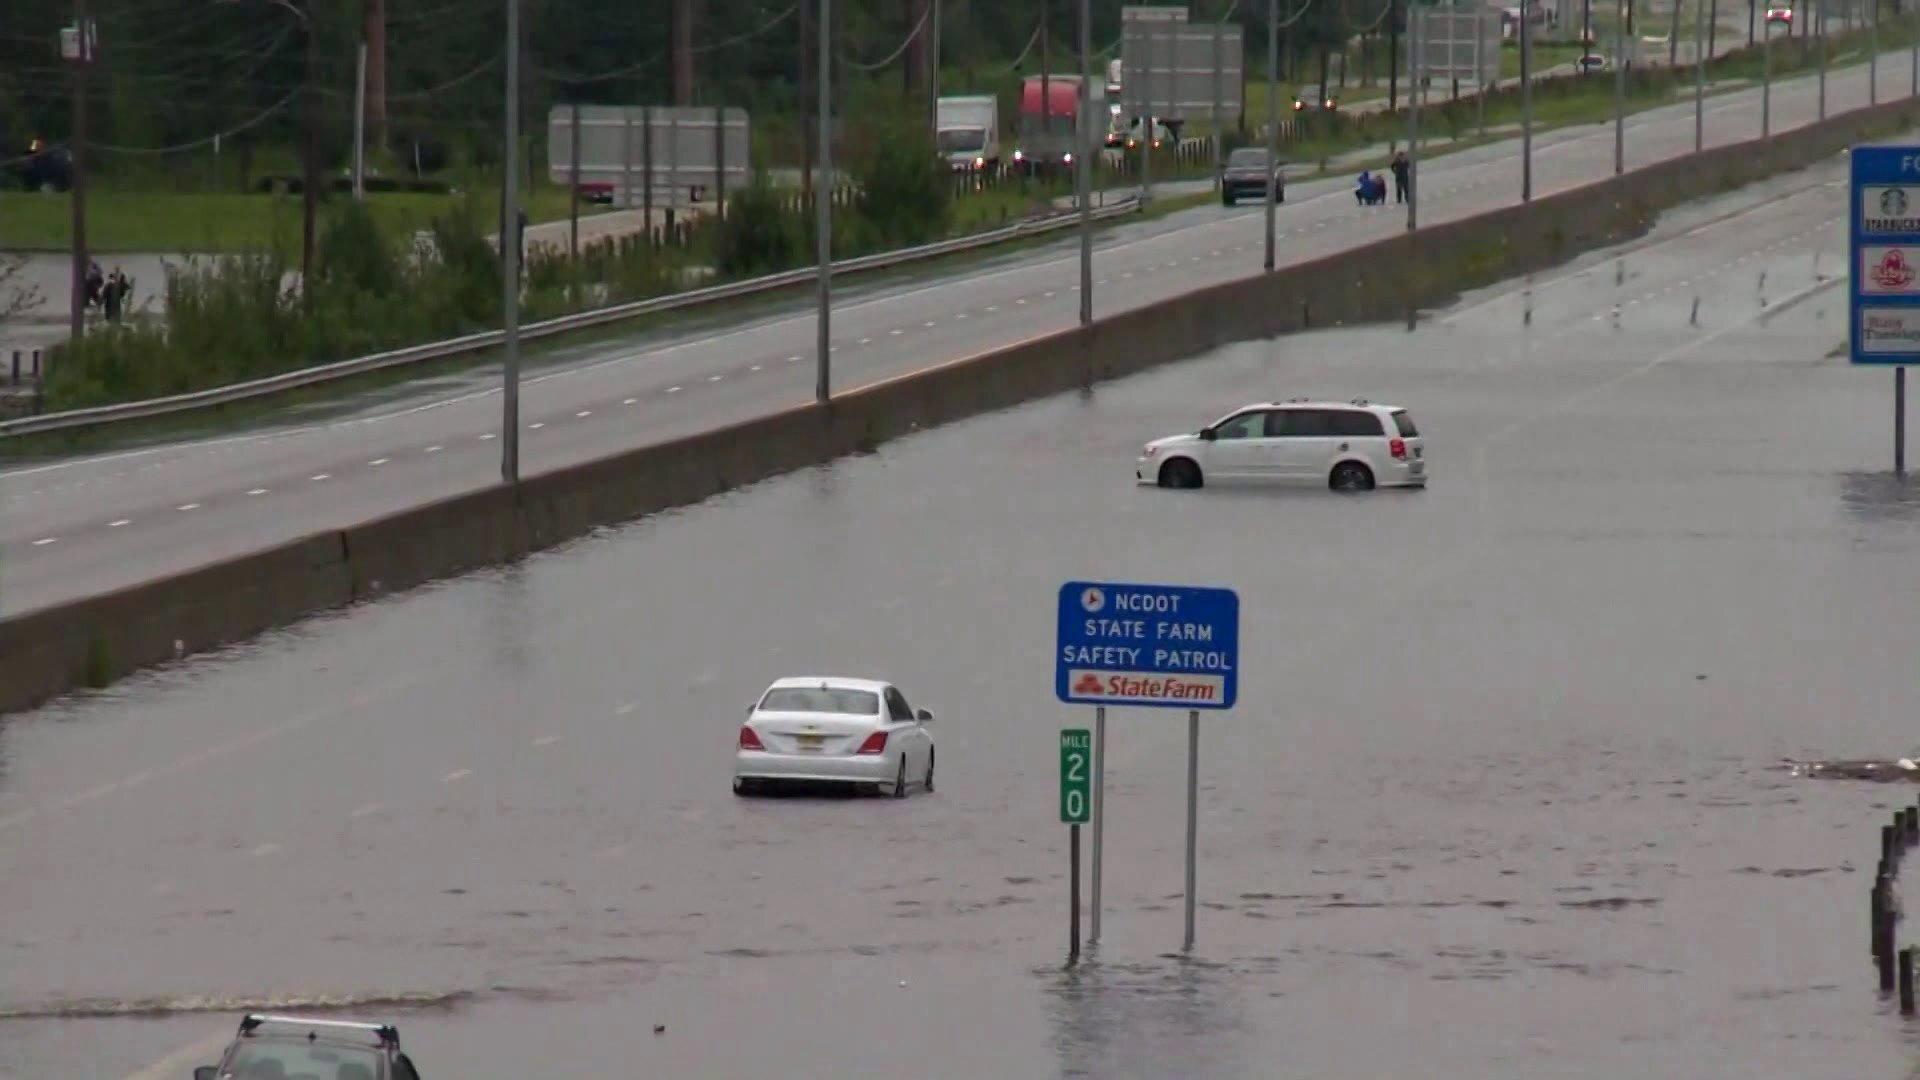 Photos: Avoid I-95: Drivers told to 'go around' NorthCarolina